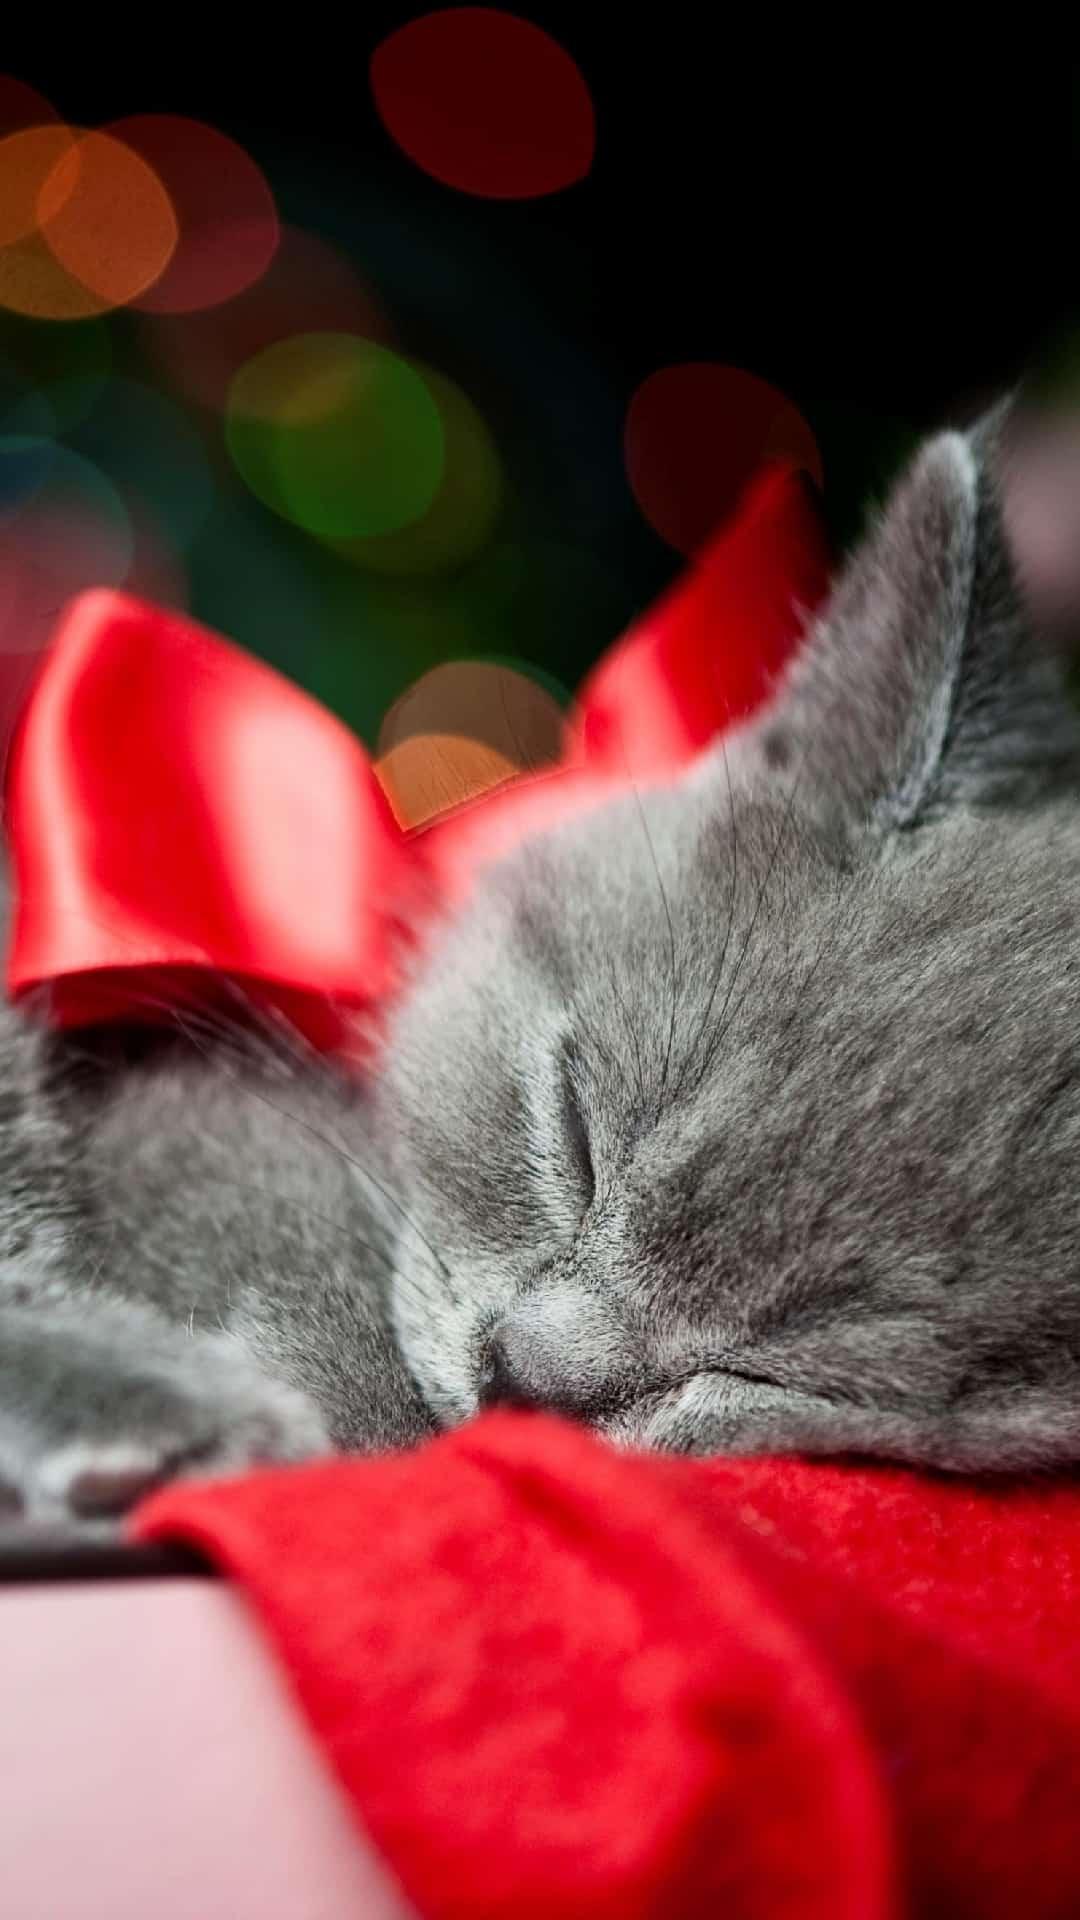 Grey Kitten Red Ribbon Christmas Present Bokeh Android Wallpaper